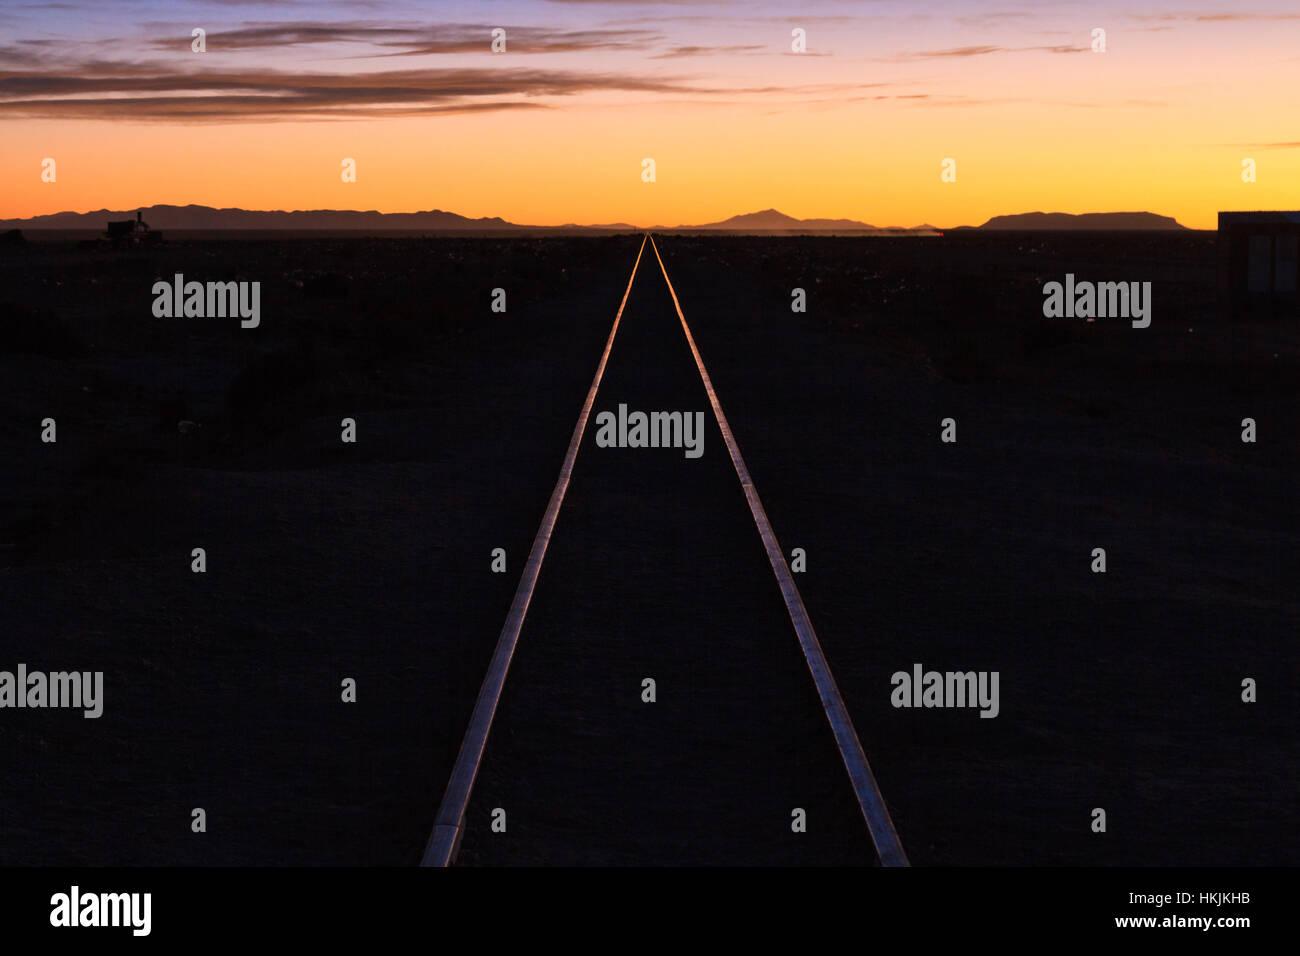 Rail track through the desert at sunset, Uyuni, Bolivia - Stock Image